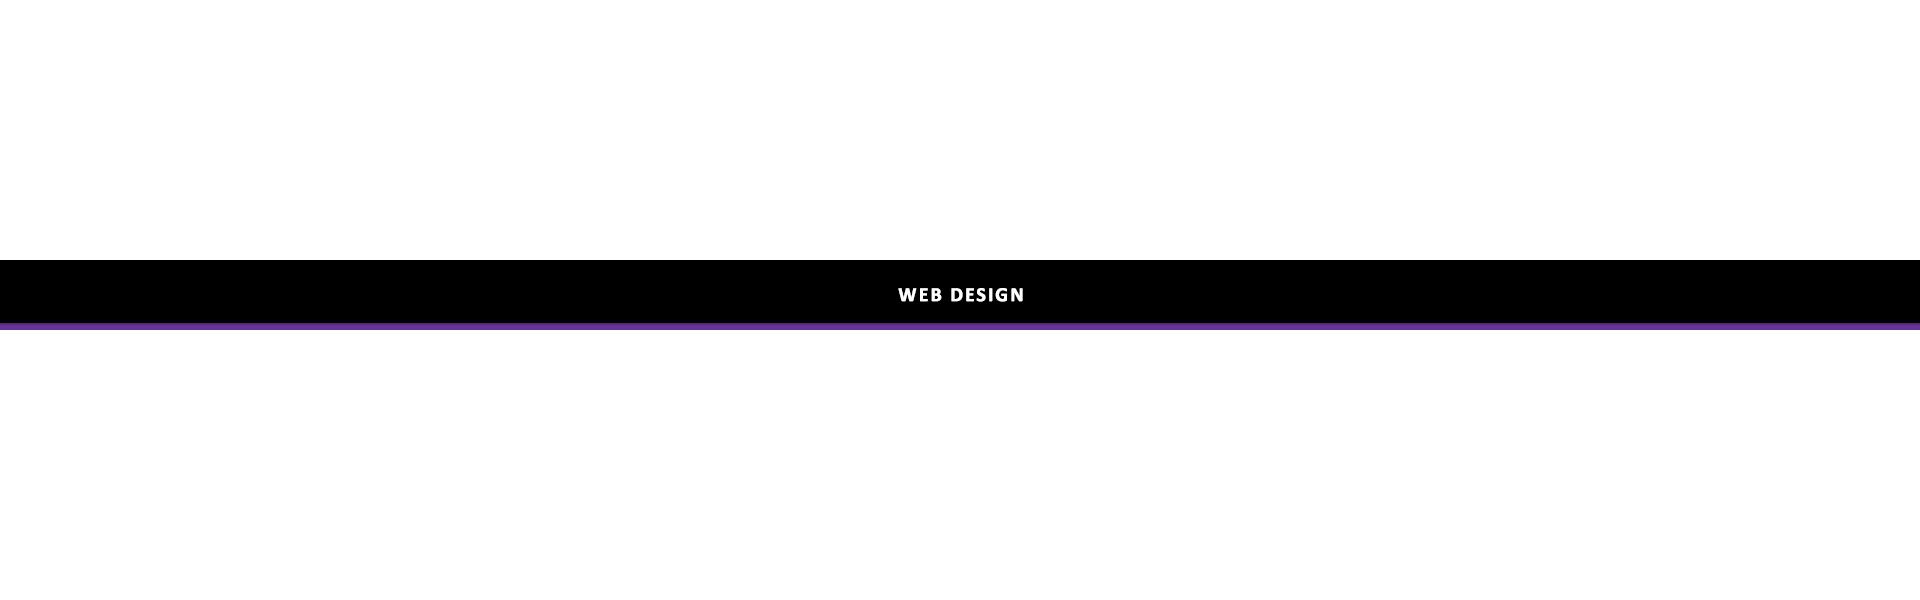 YPod Media Web Design Slider